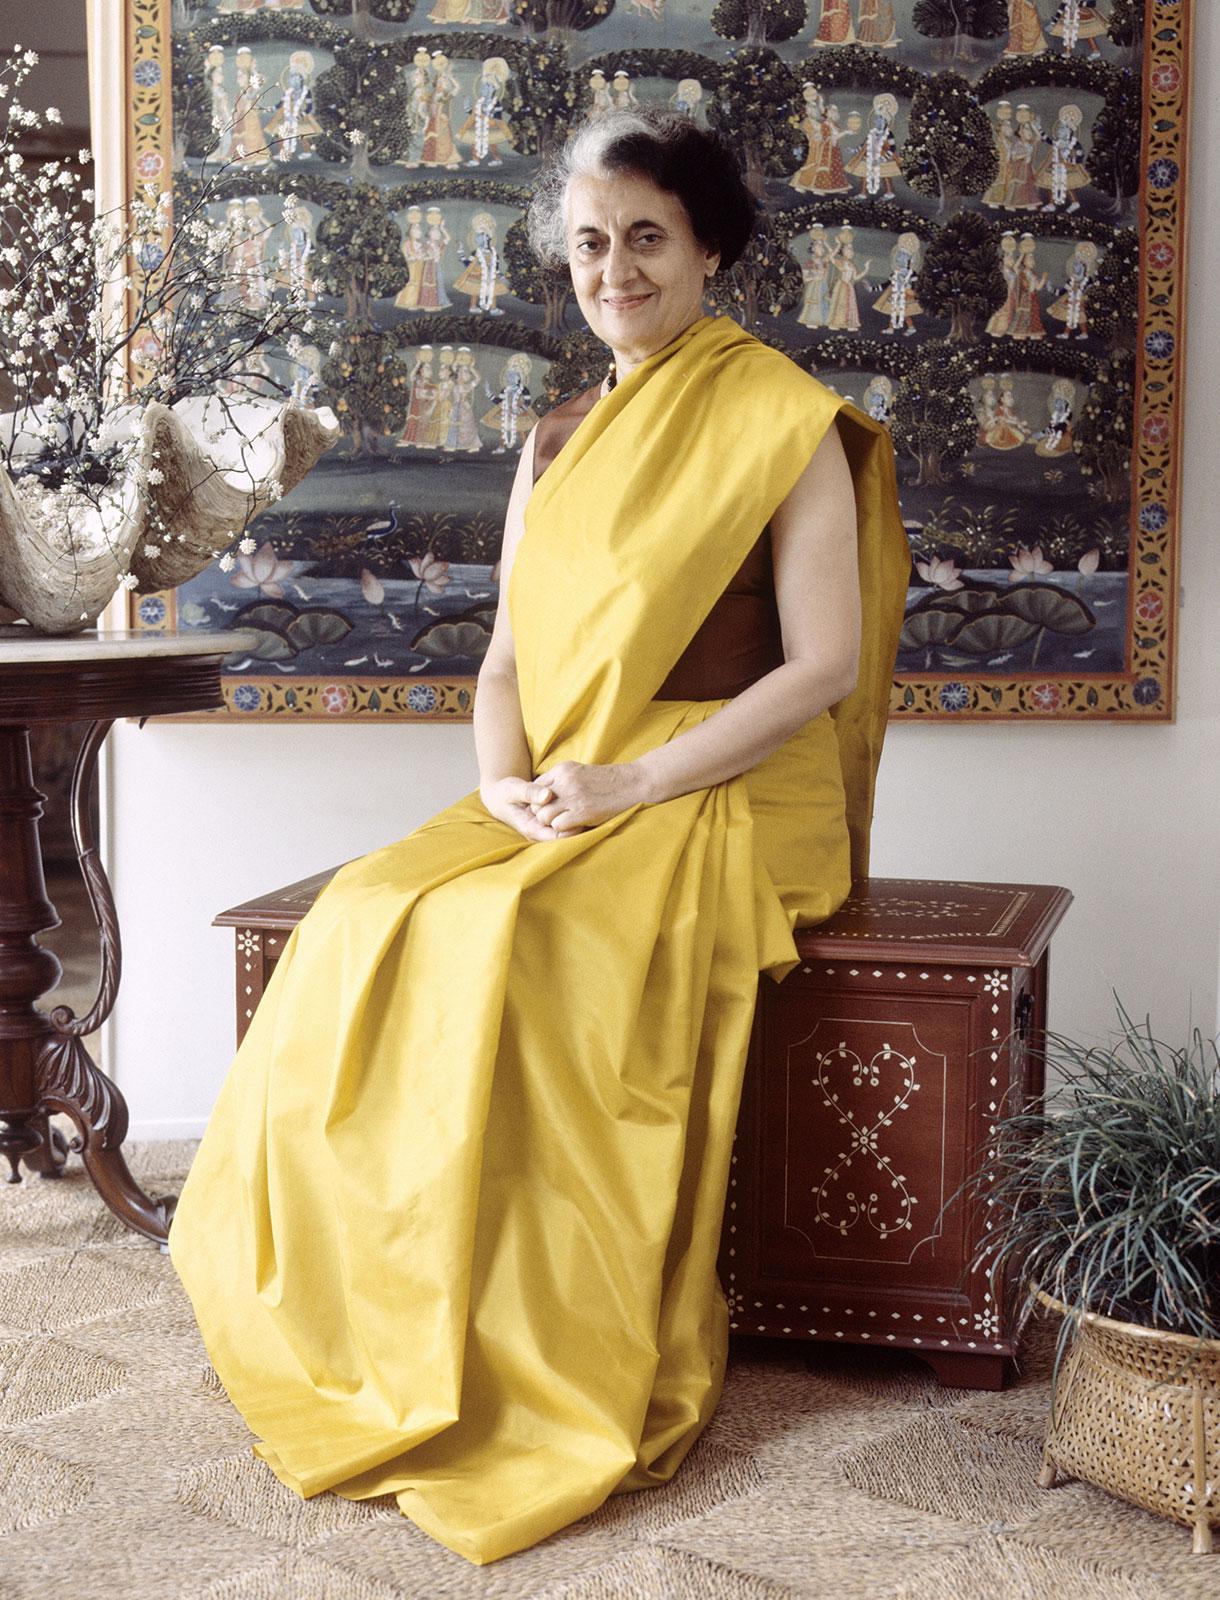 Indira Gandhi Hd Greetings For WhatsApp